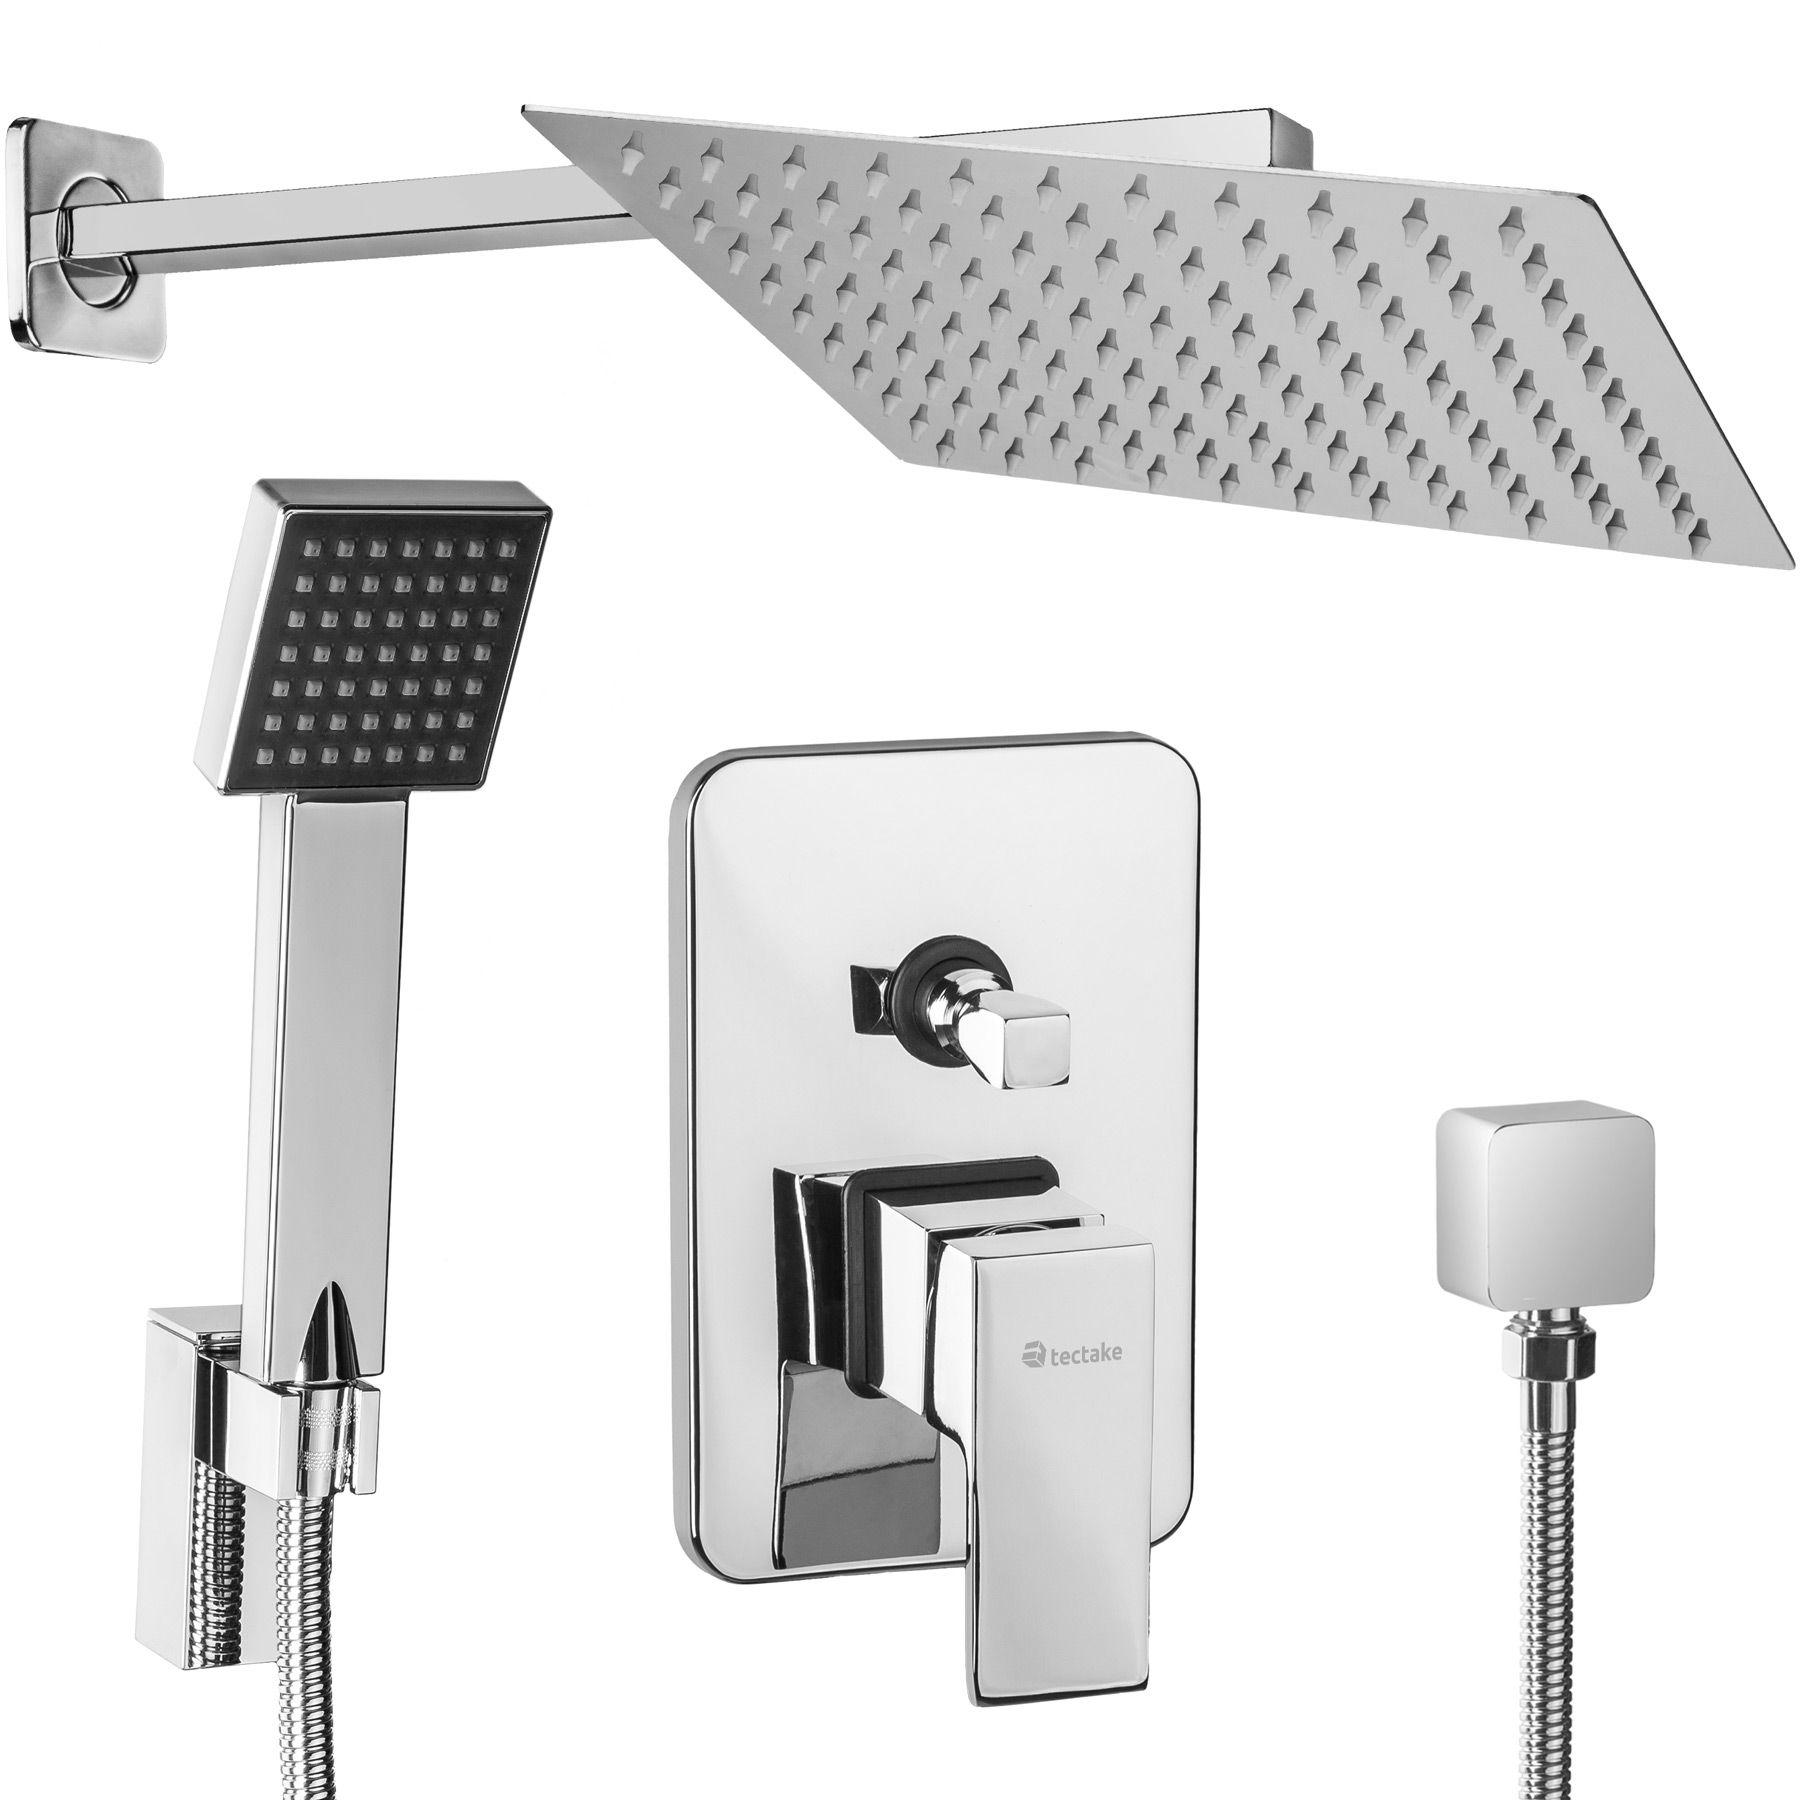 Details About Complete Shower Set Flush Mounted Jet Rain Head Hand Spray Mixer Bathroom Bath